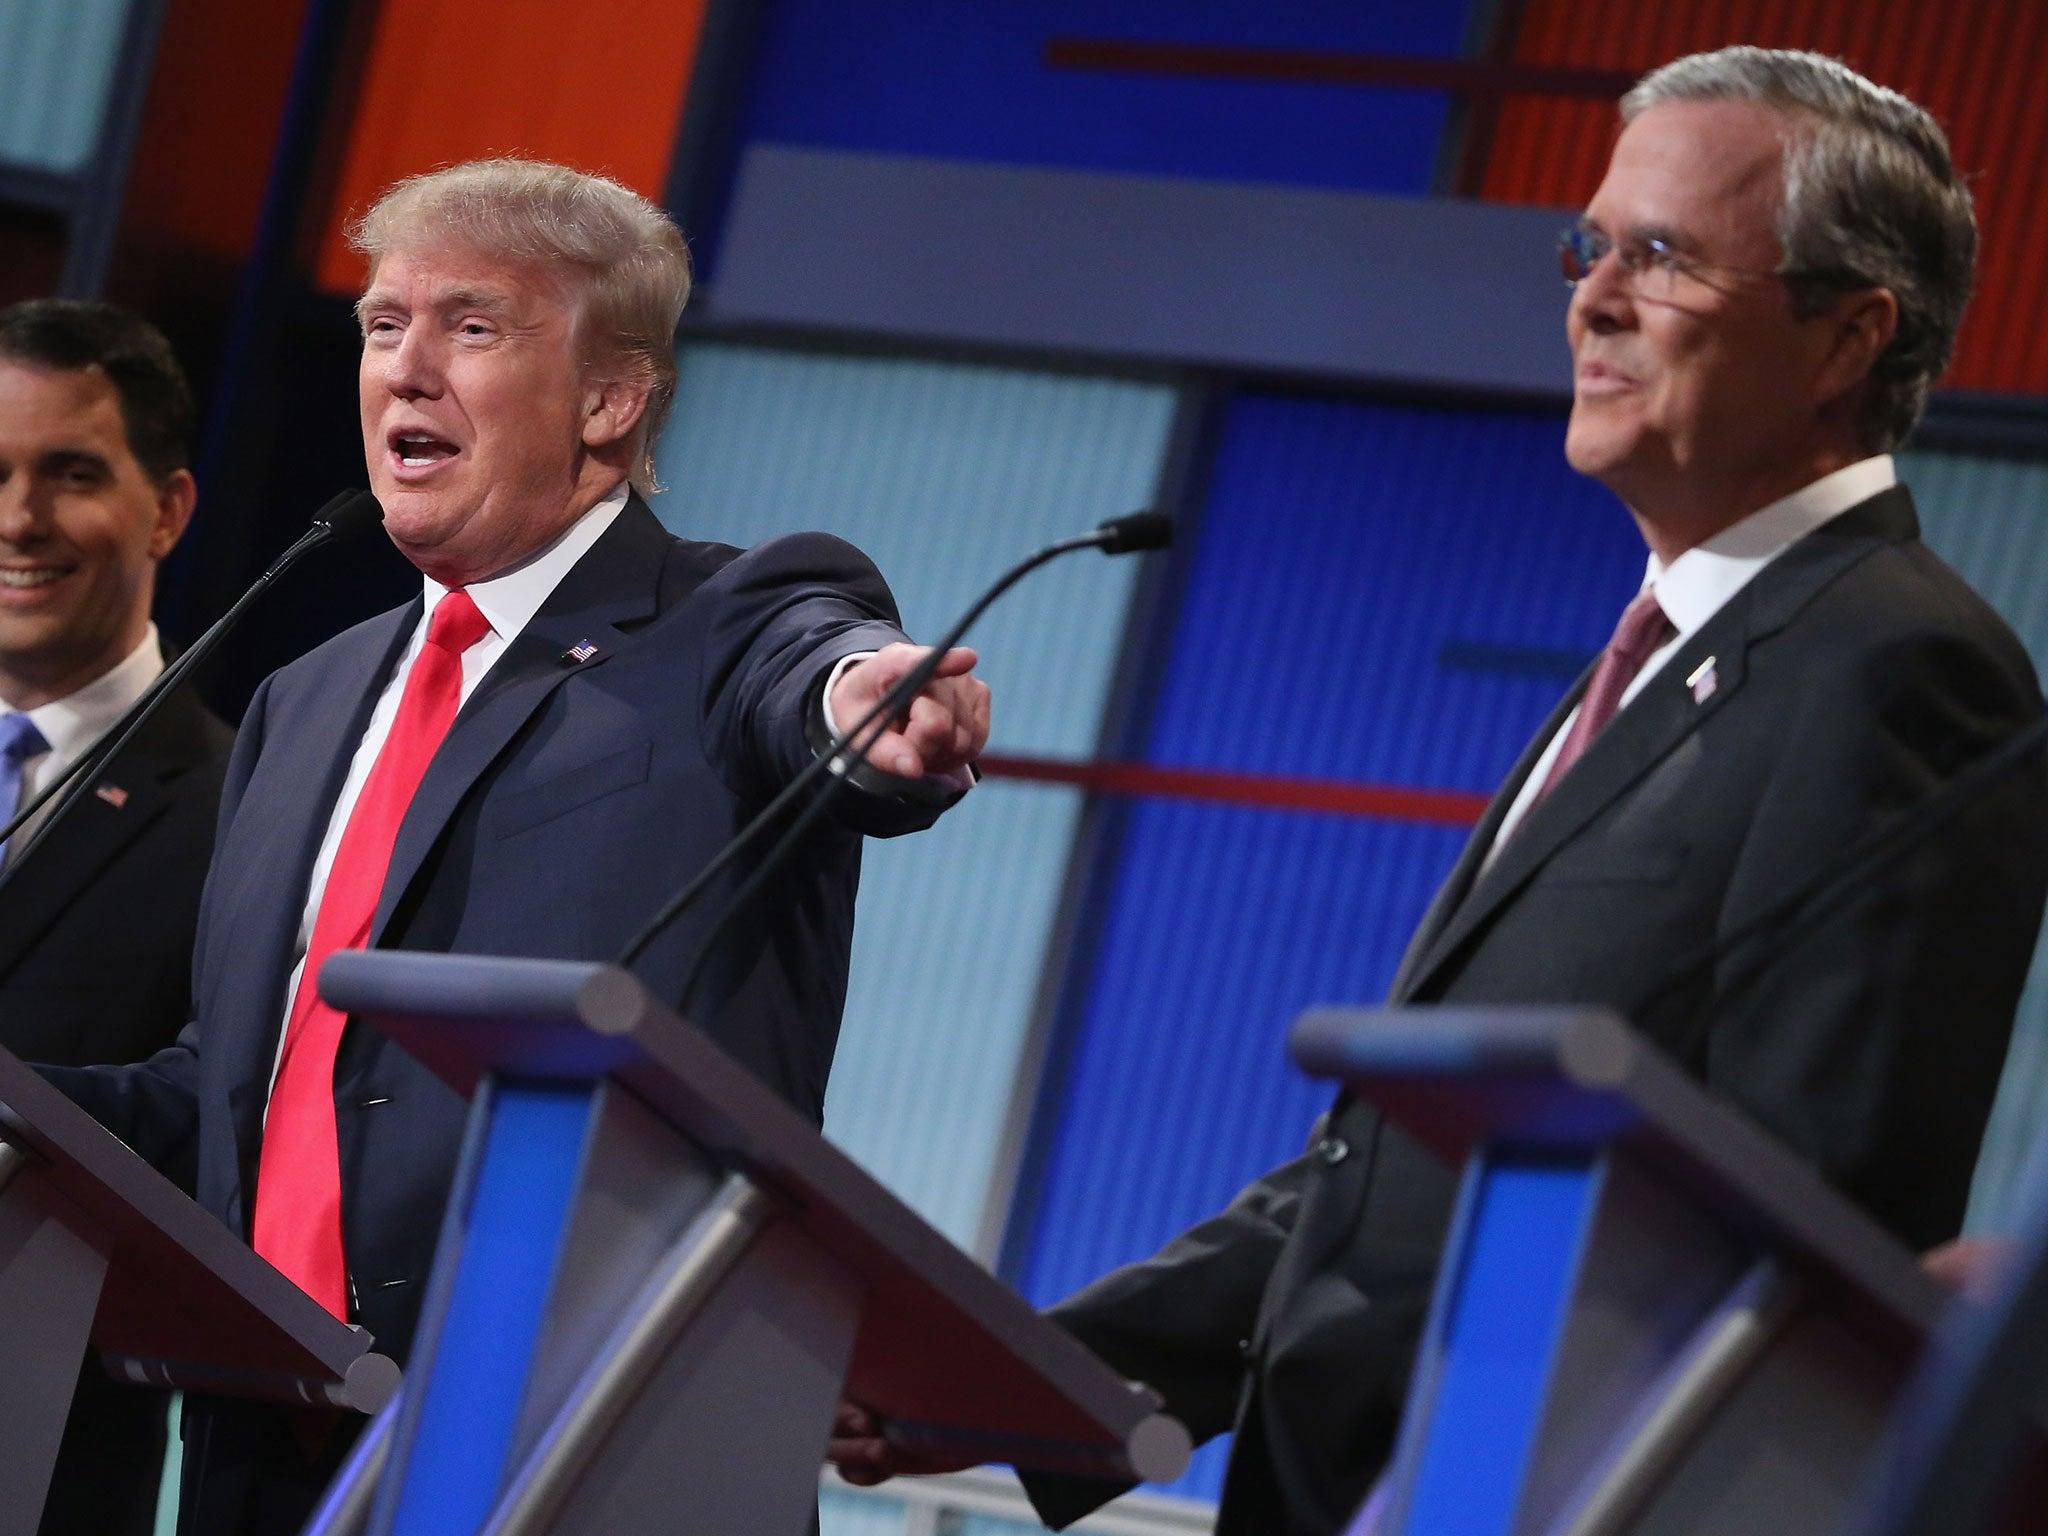 Poll: Donald Trump, Ben Carson, Carly Fiorina, Jeb Bush poll ...